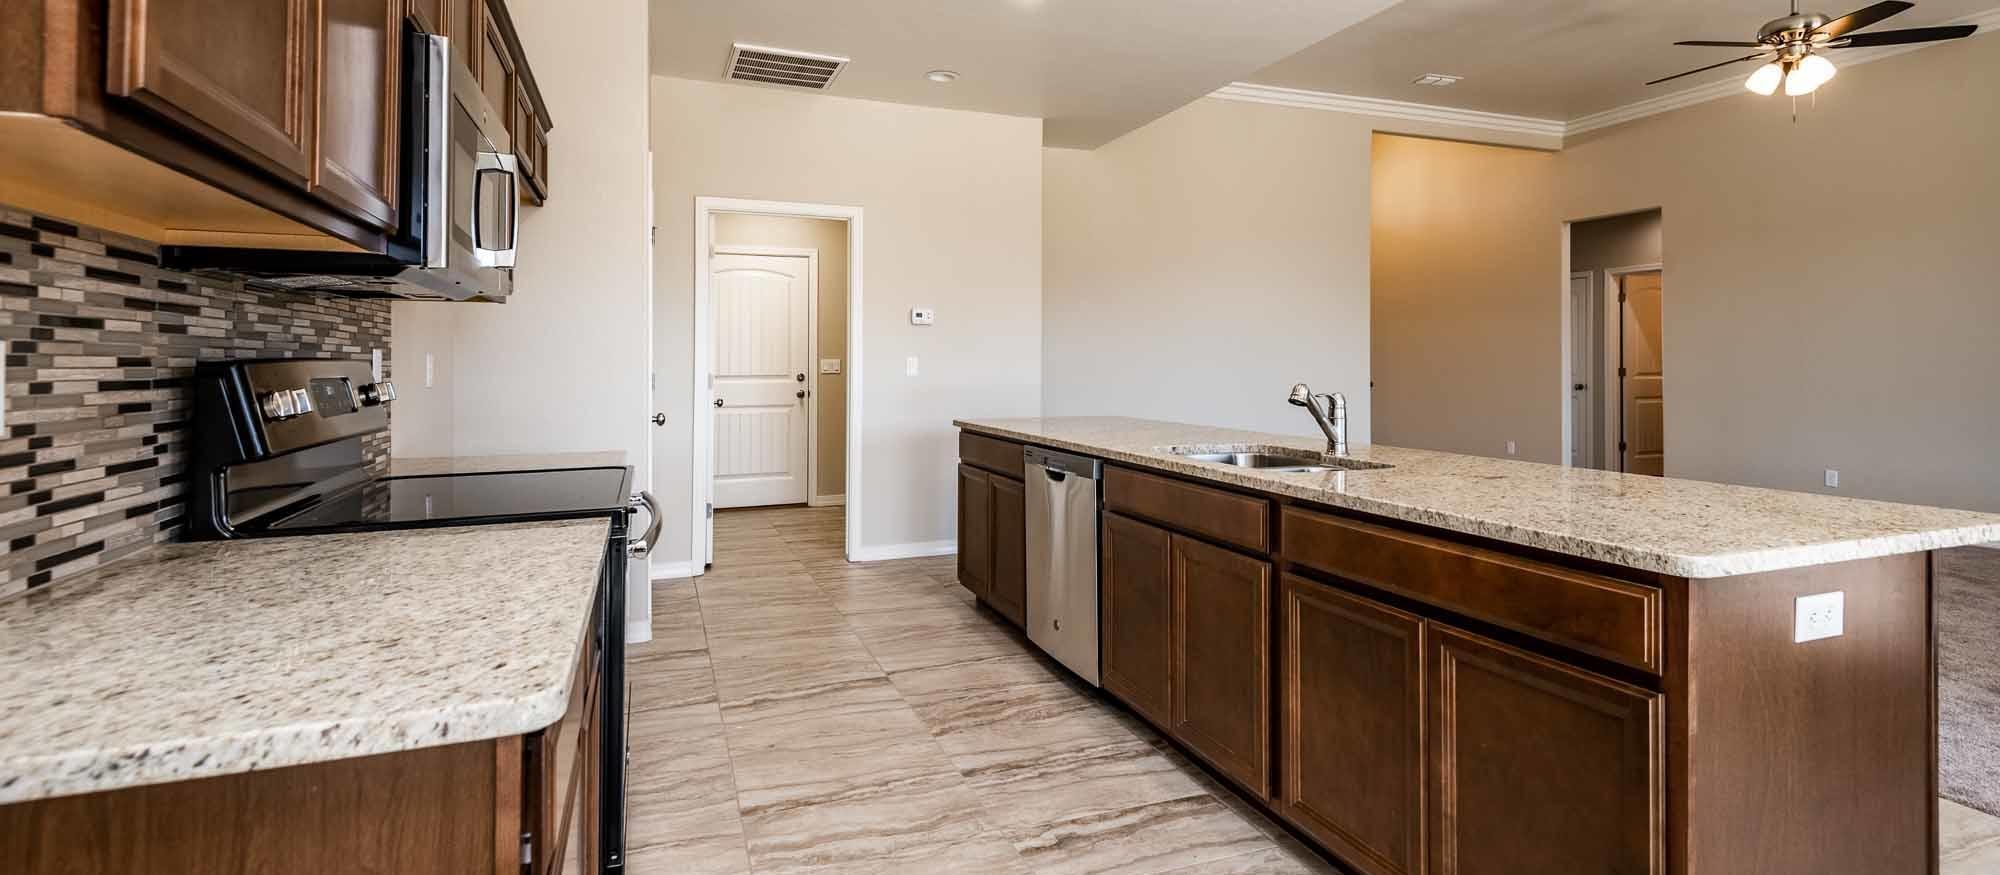 Kitchen featured in the Joshua 1909 By Angle Homes in Kingman-Lake Havasu City, AZ